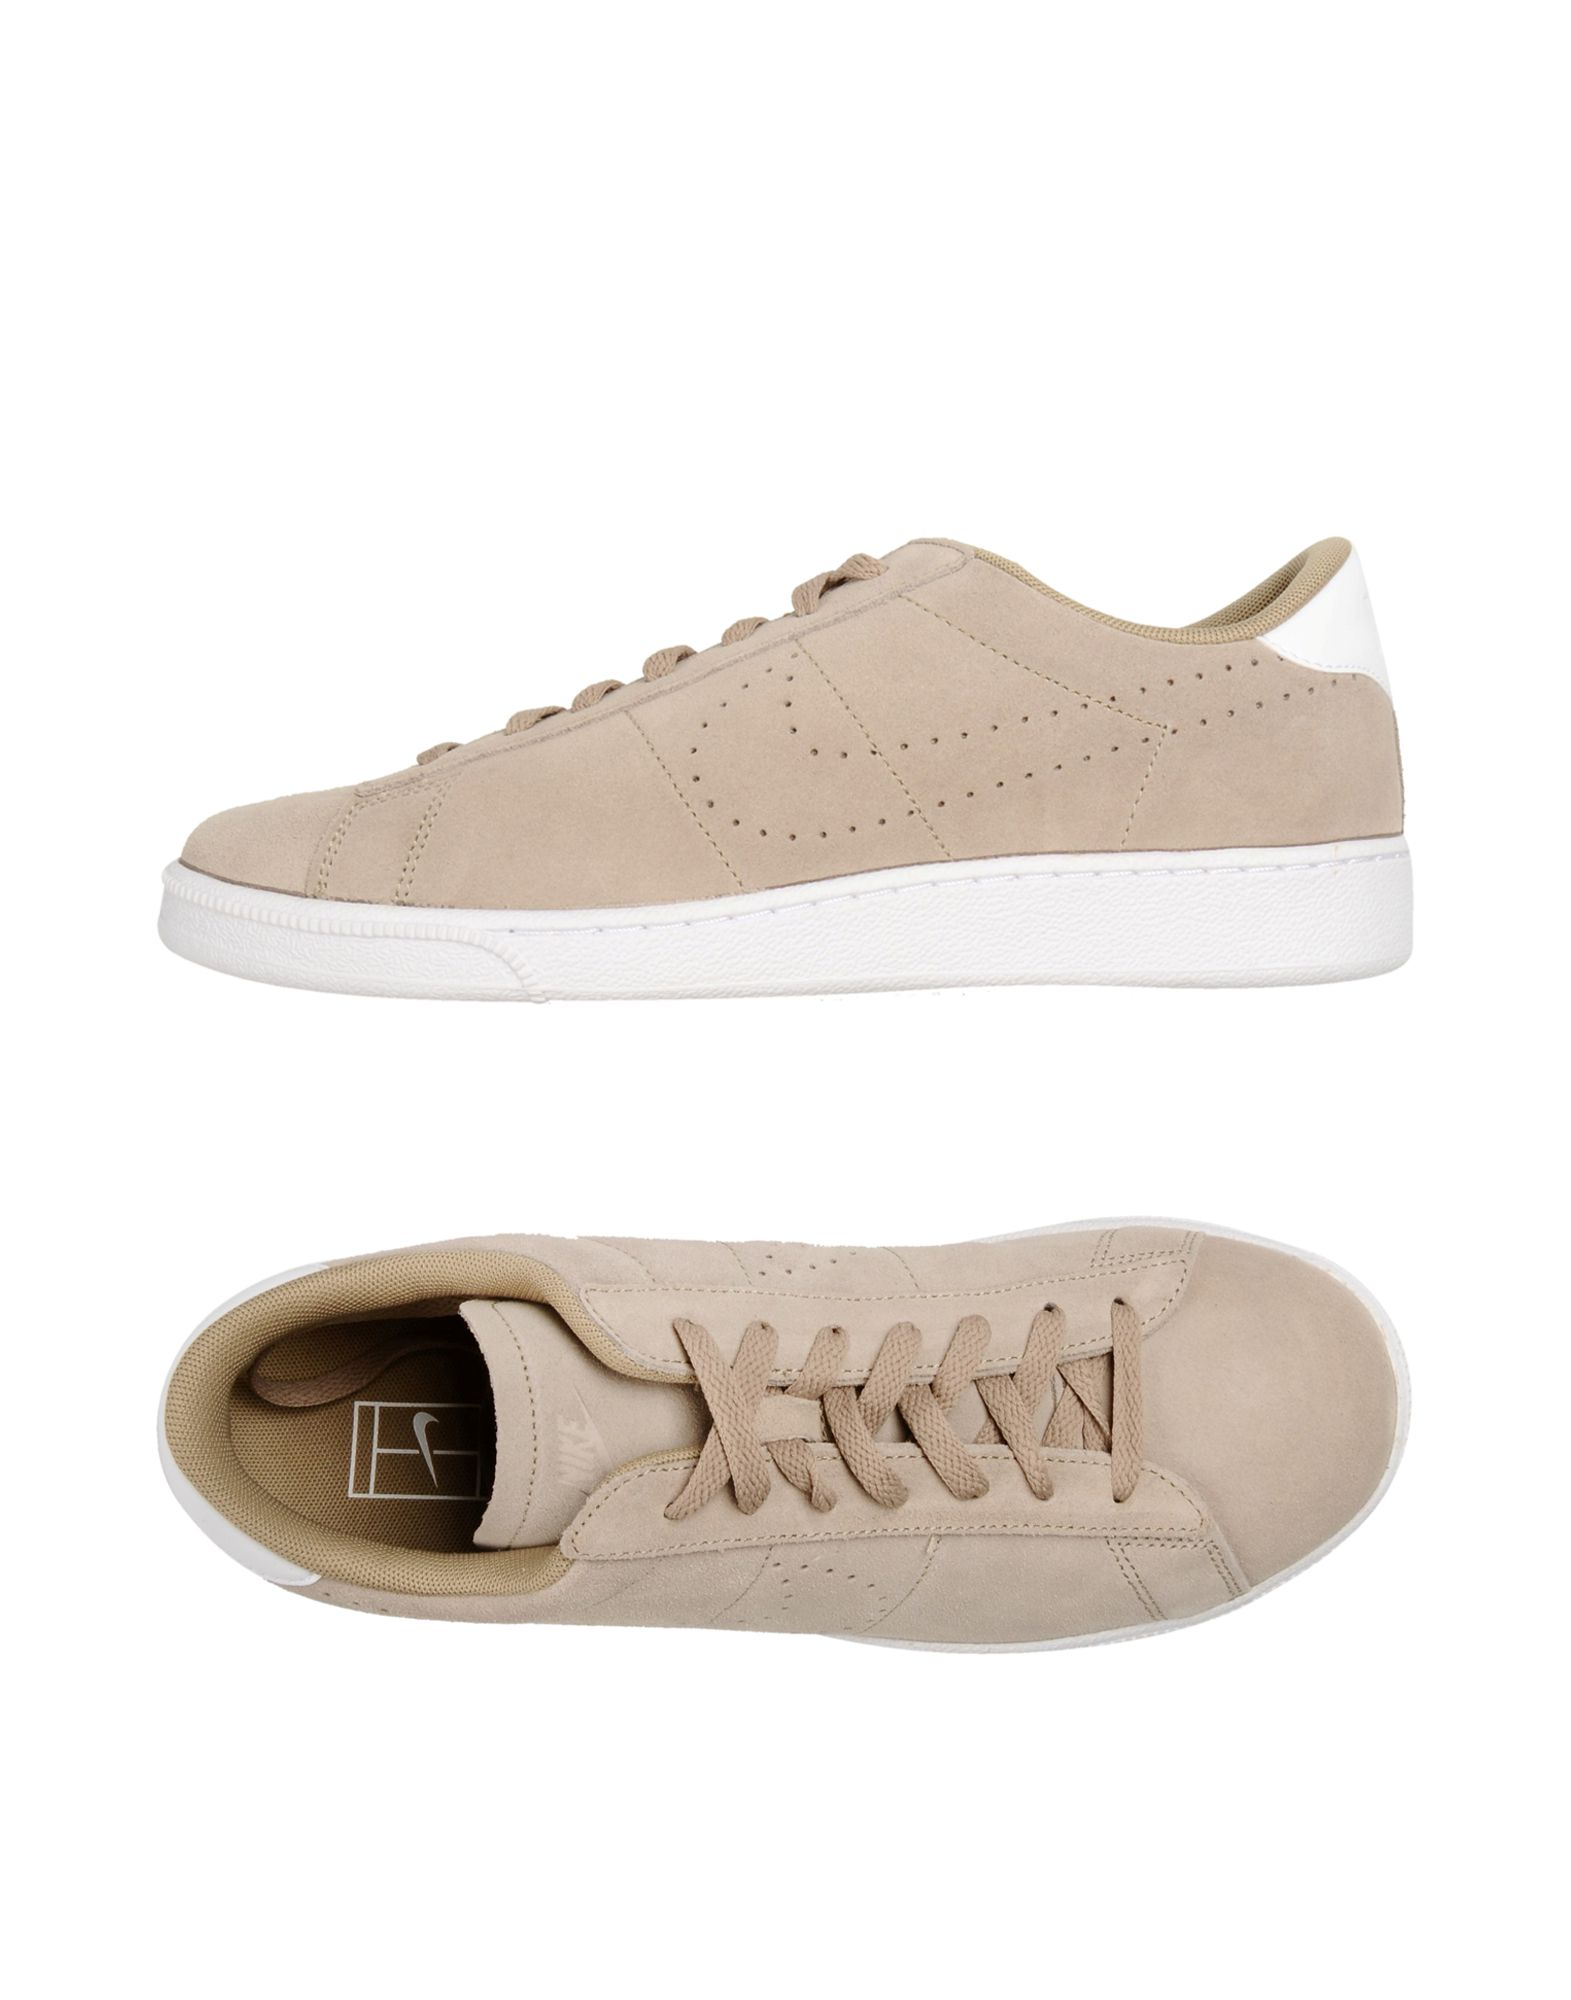 Sneakers Nike Tennis Classic Cs Suede - Uomo - 11099310QX